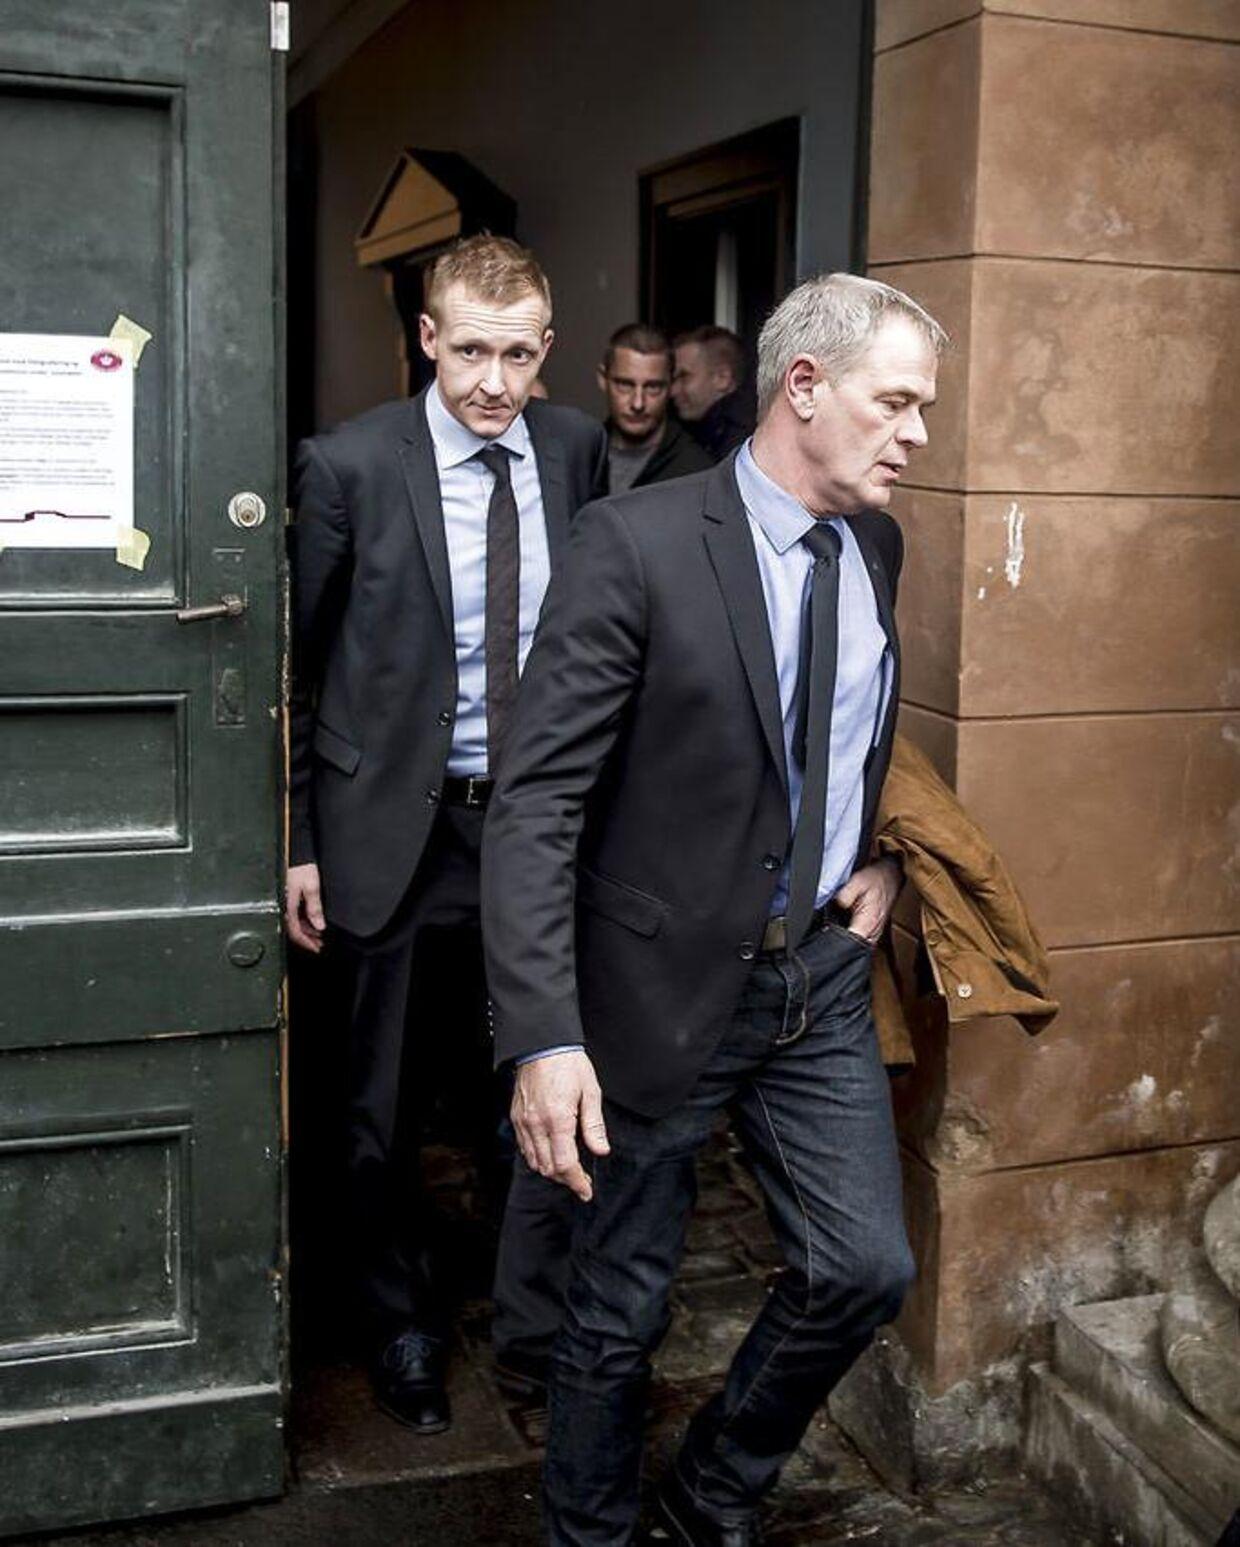 Virkelighedens anklager, Jakob Buch-Jepsen, og vicepolitiinspektør Jens Møller forlader retsbygningen i en pause under retssagen mod Peter Madsen.